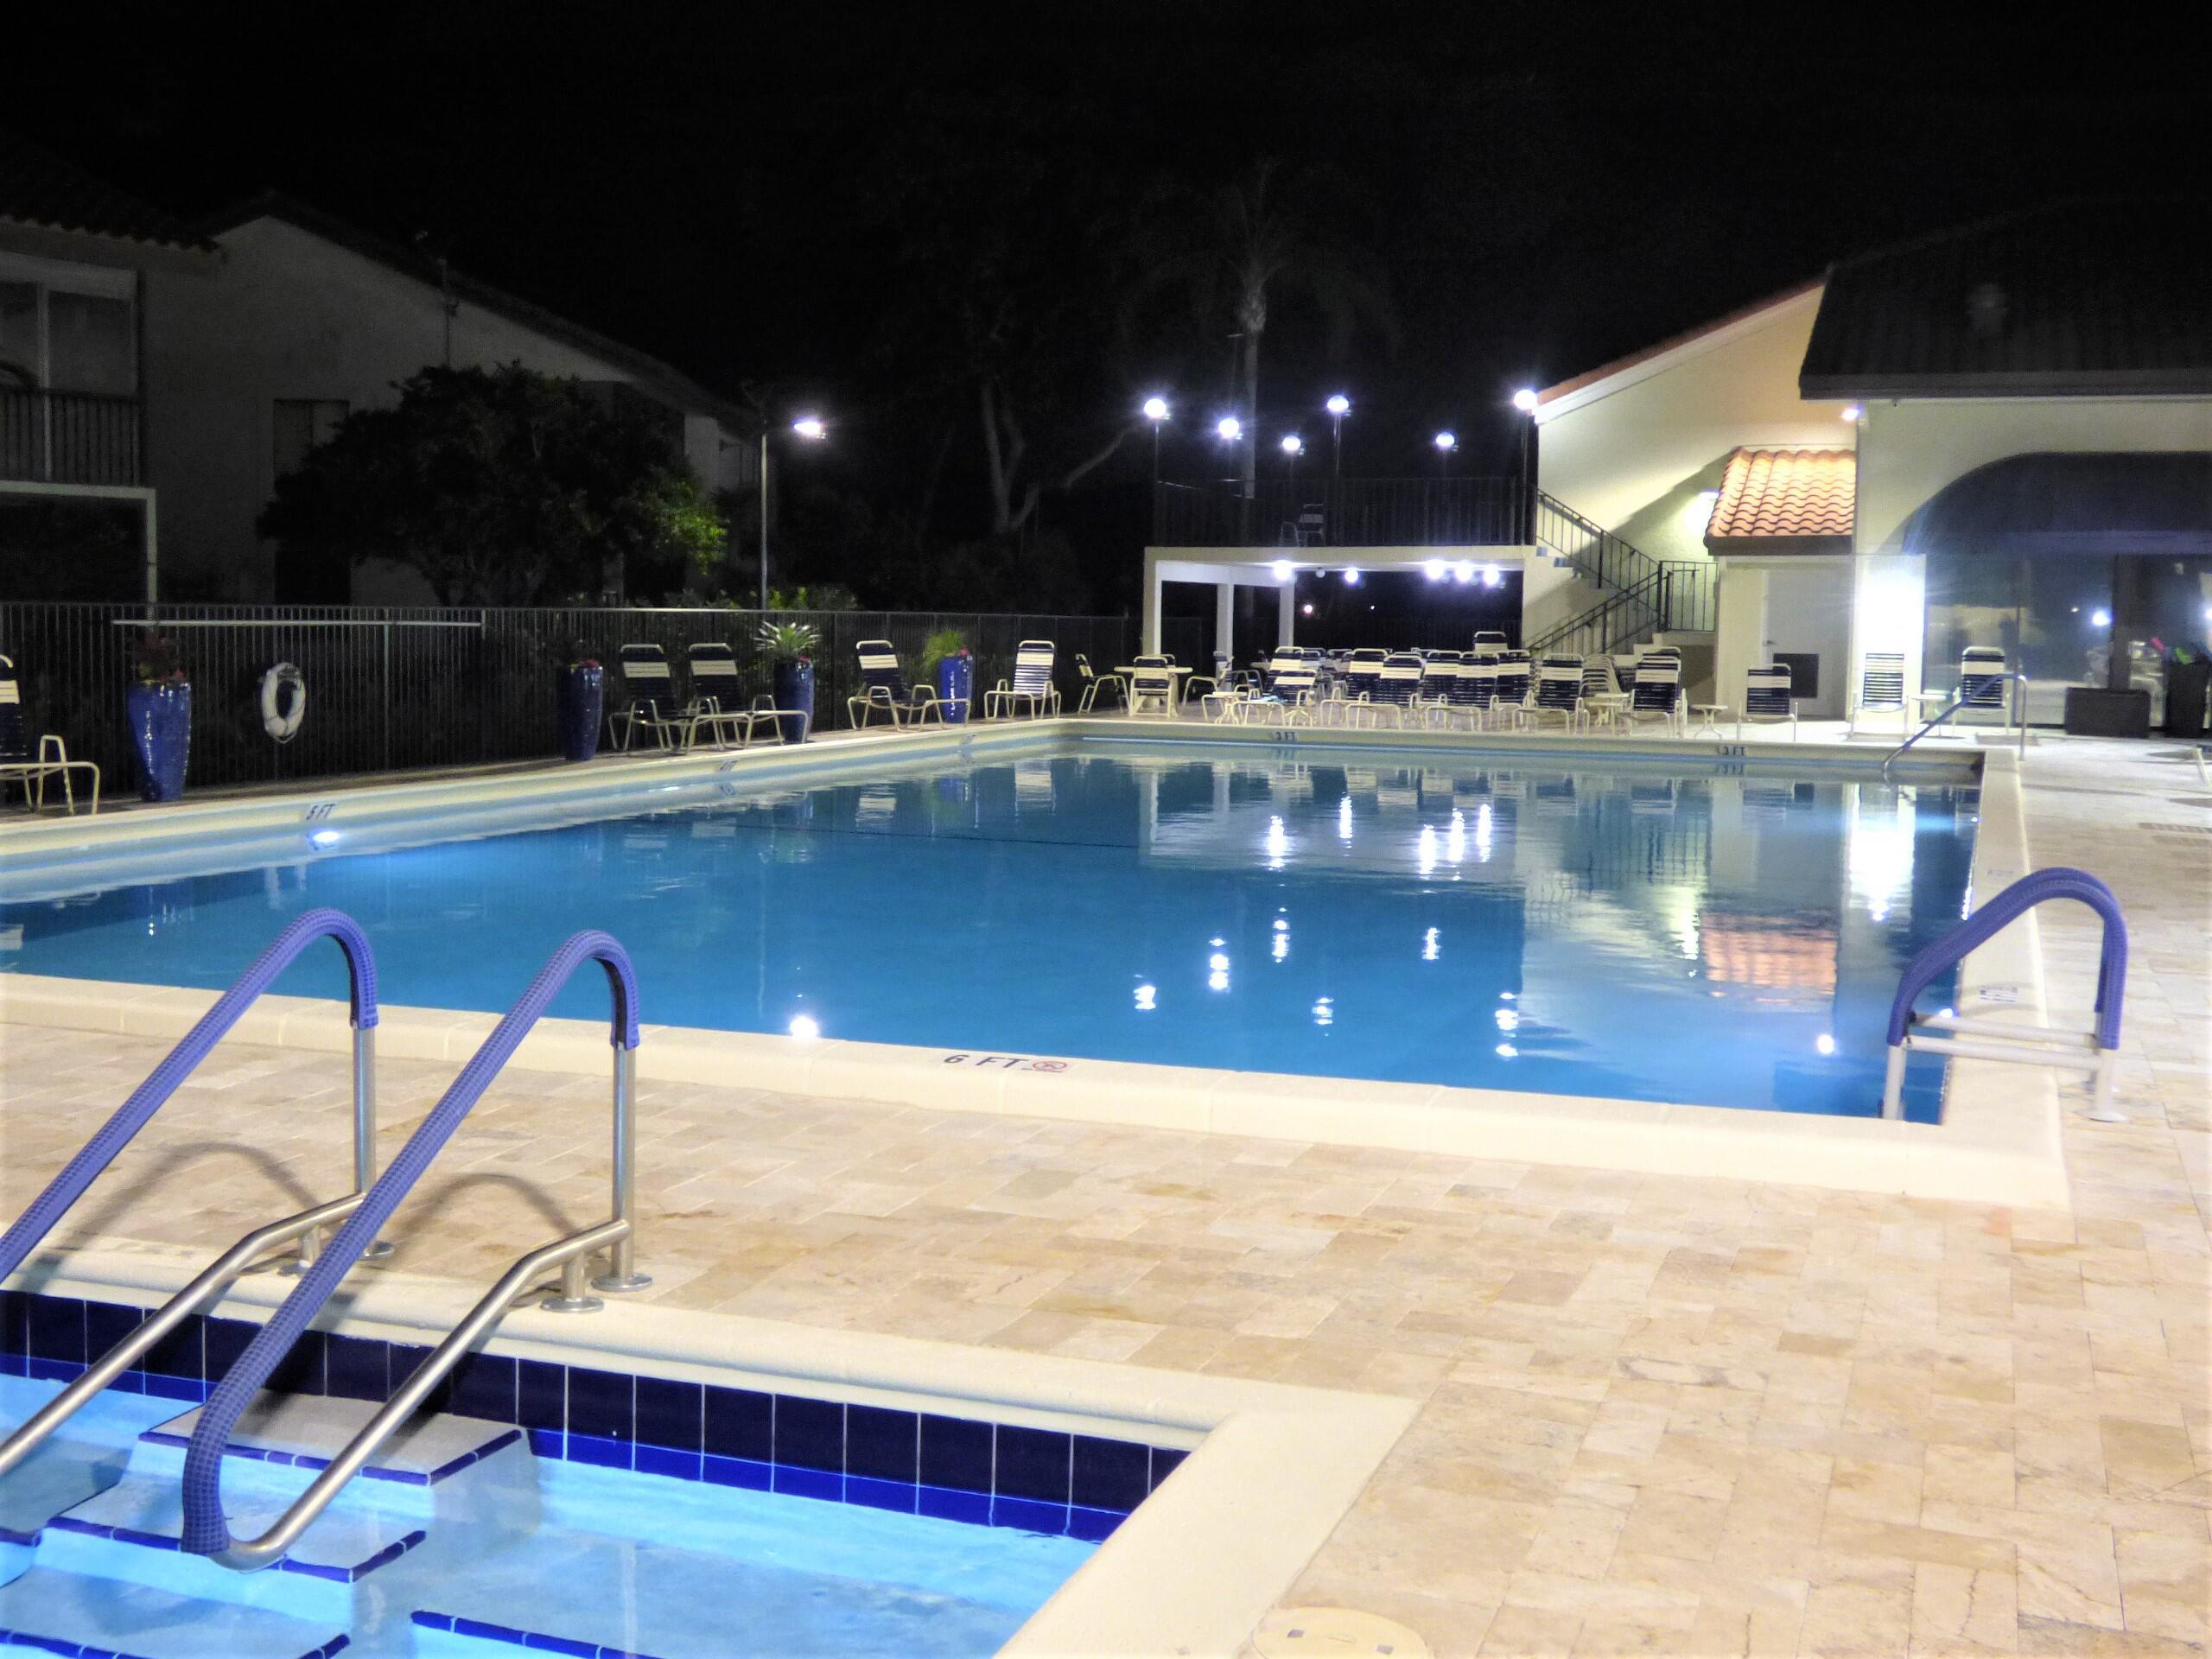 10804 Bahama Palm Way 101 Boynton Beach, FL 33437 photo 75